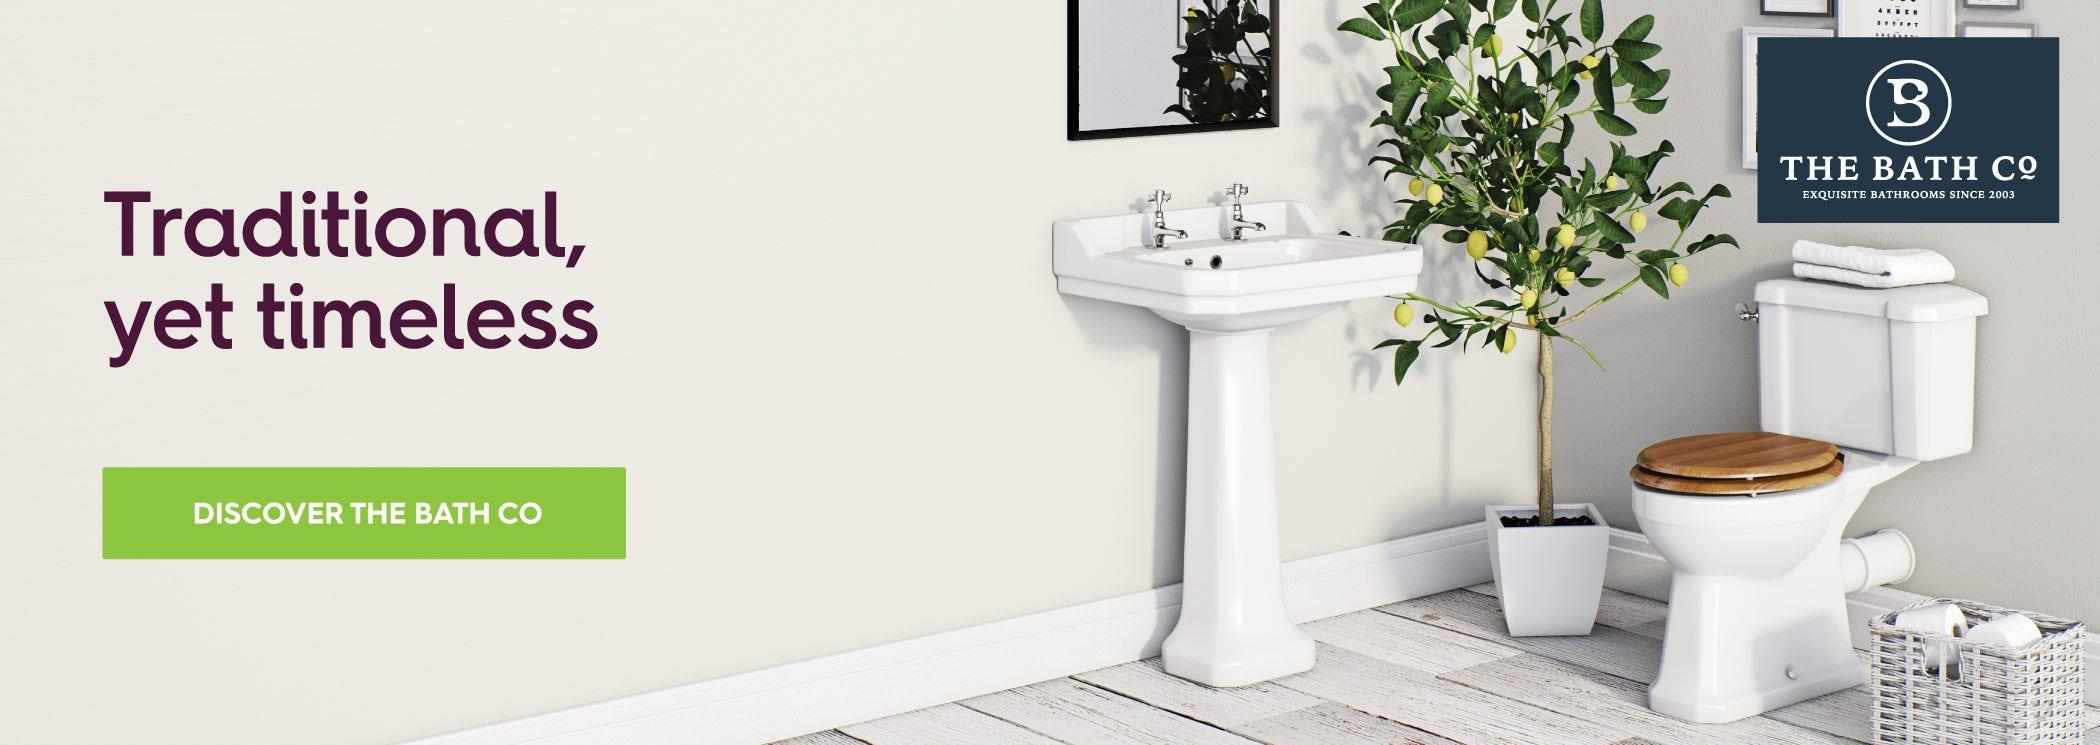 The Bath Co Bathrooms